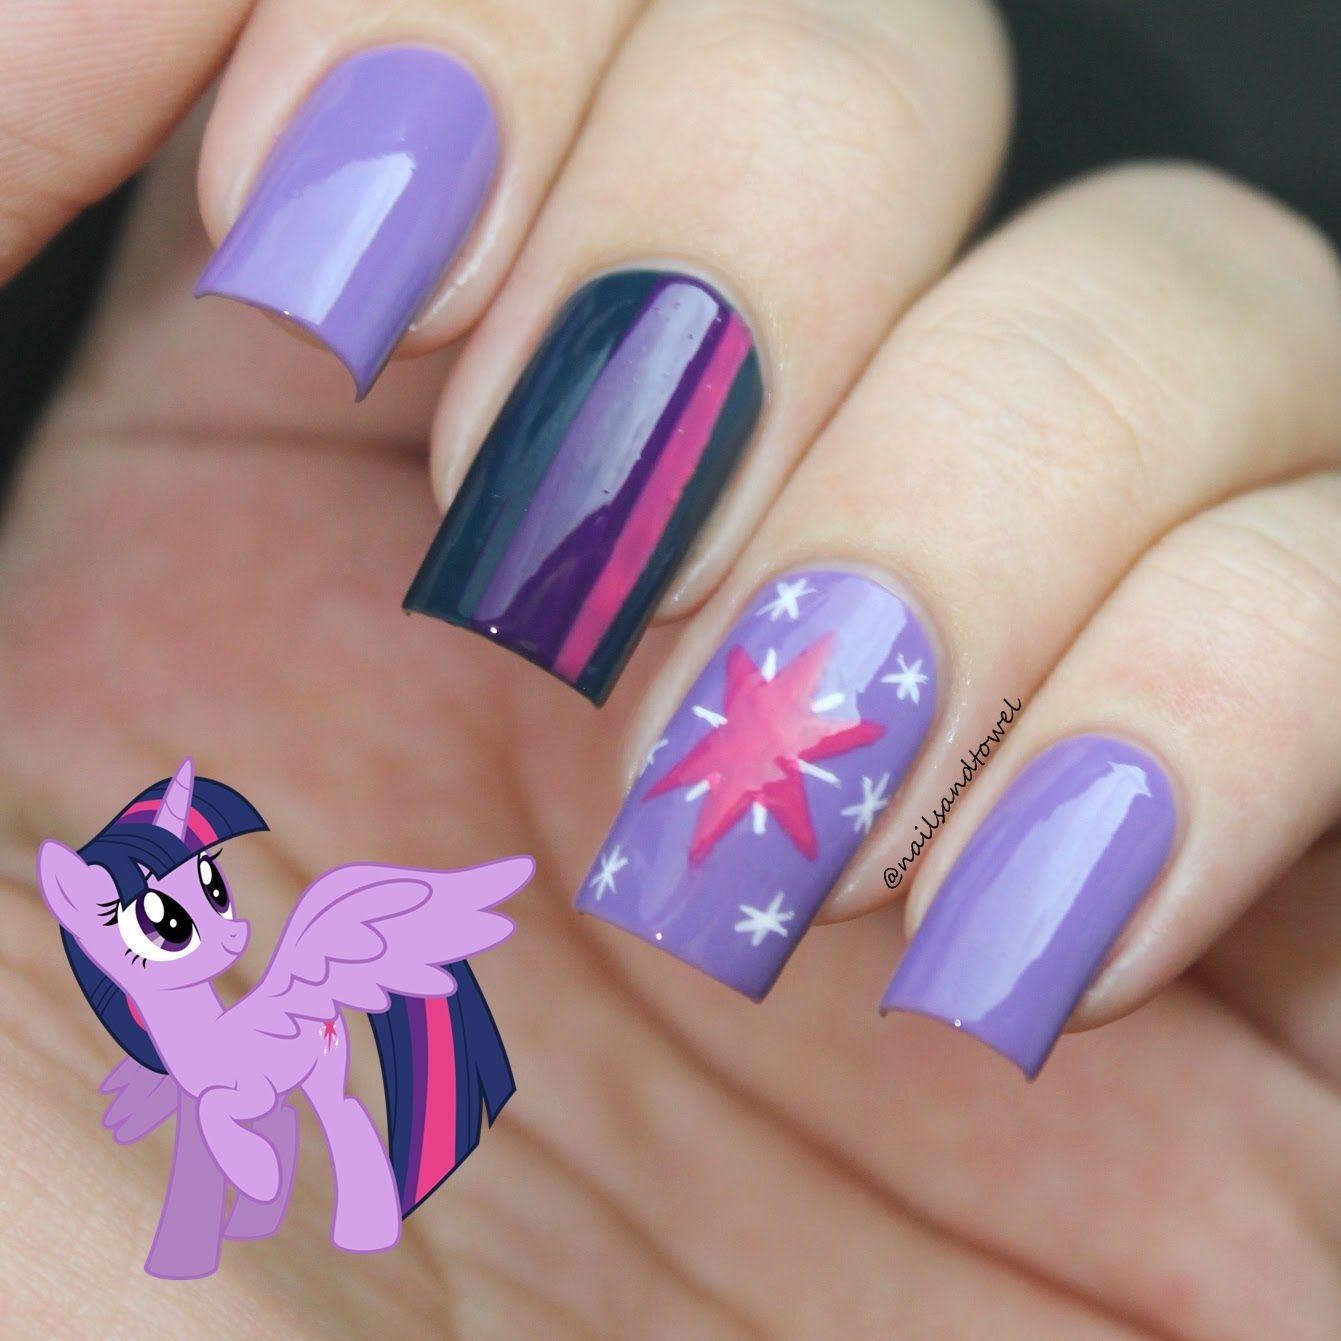 Little Google1 Nail Art: My Nail Art Journal: My Little Pony Nails Inspired